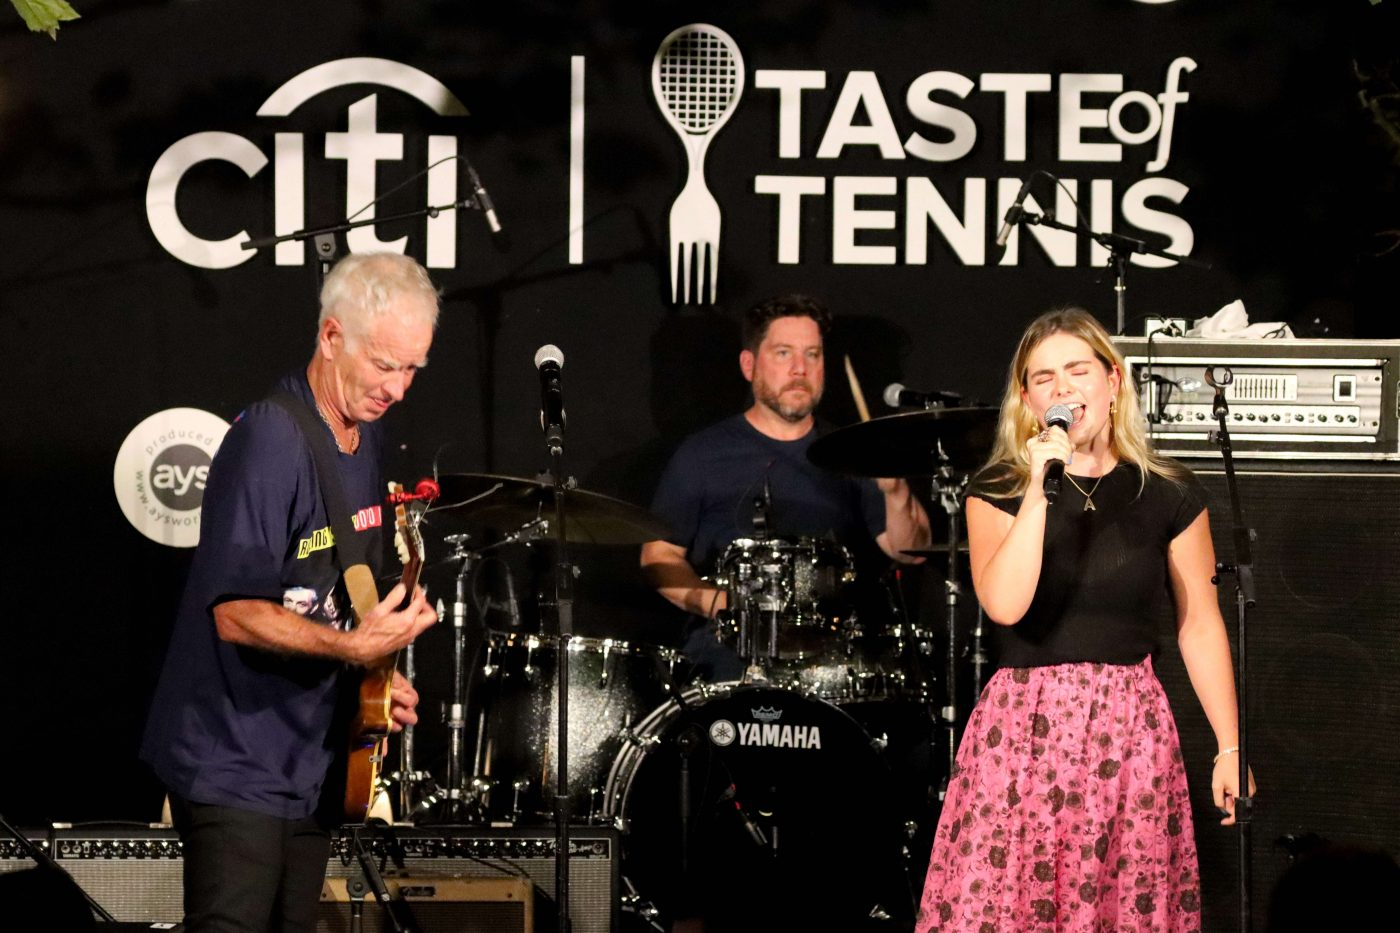 Taste of Tennis - John and Ava McEnroe Singing at Tavern on the Green